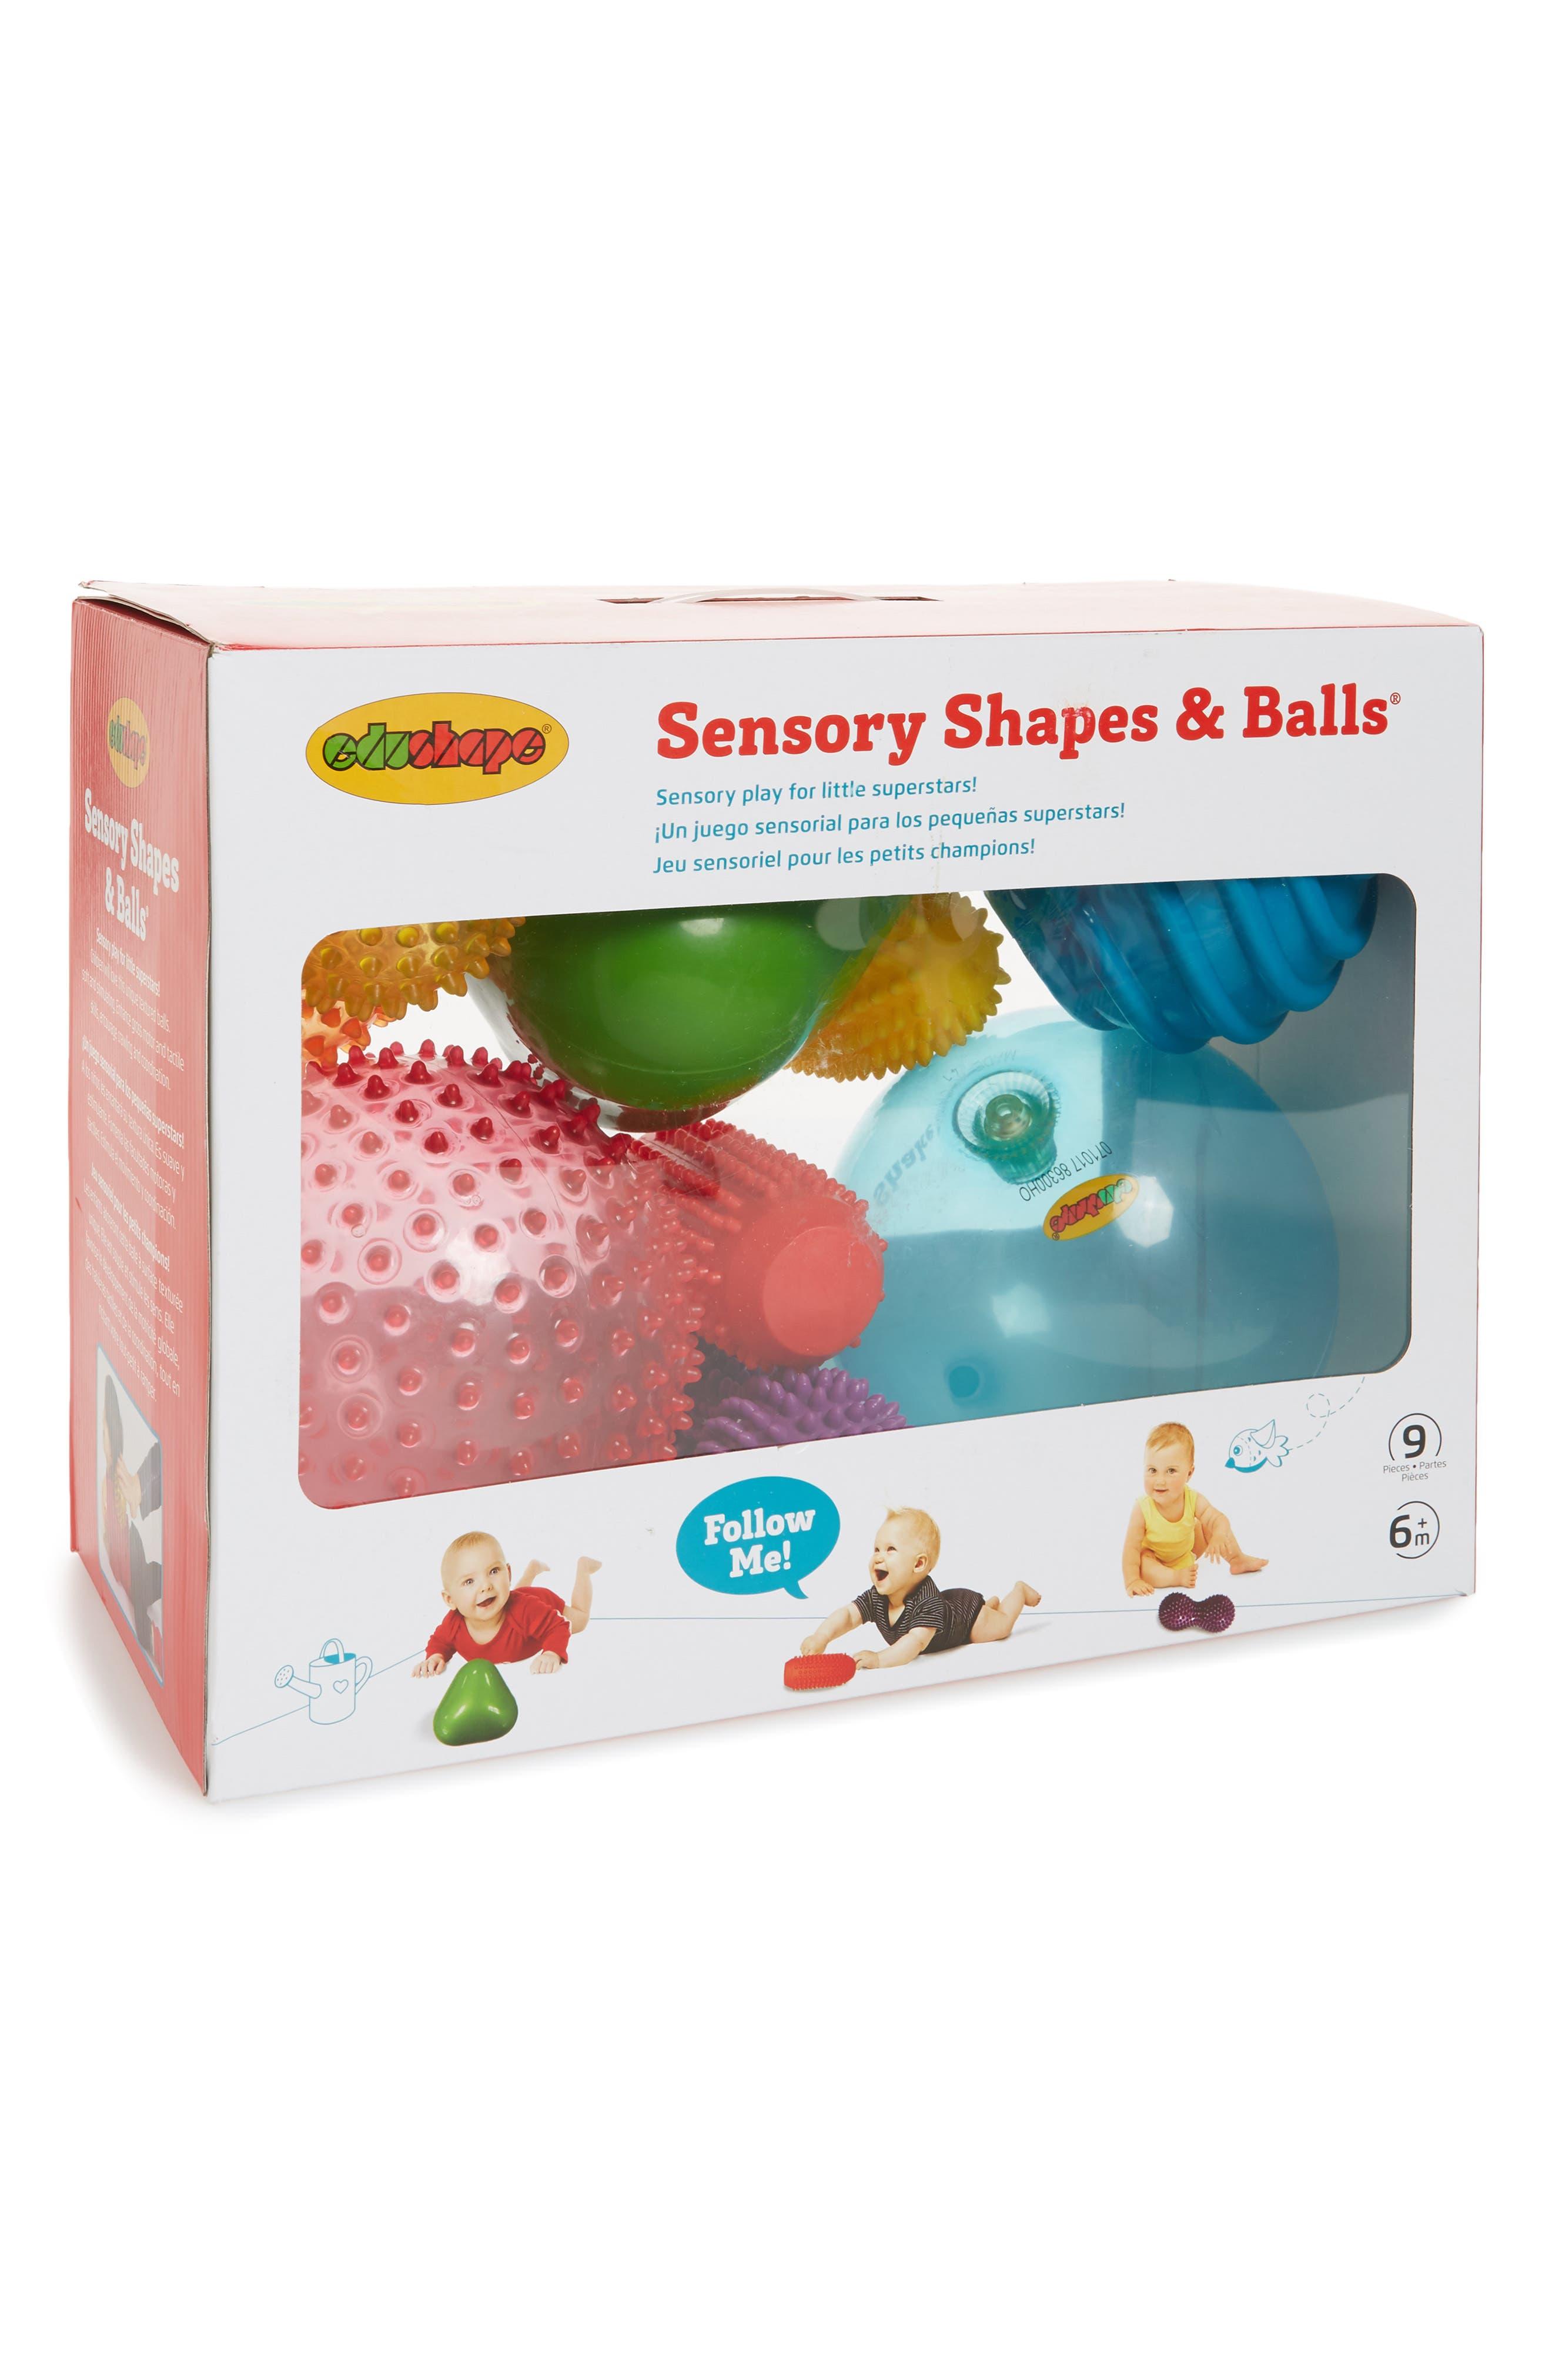 Sensory Shapes & Balls 9-Piece Toy Set,                             Main thumbnail 1, color,                             600